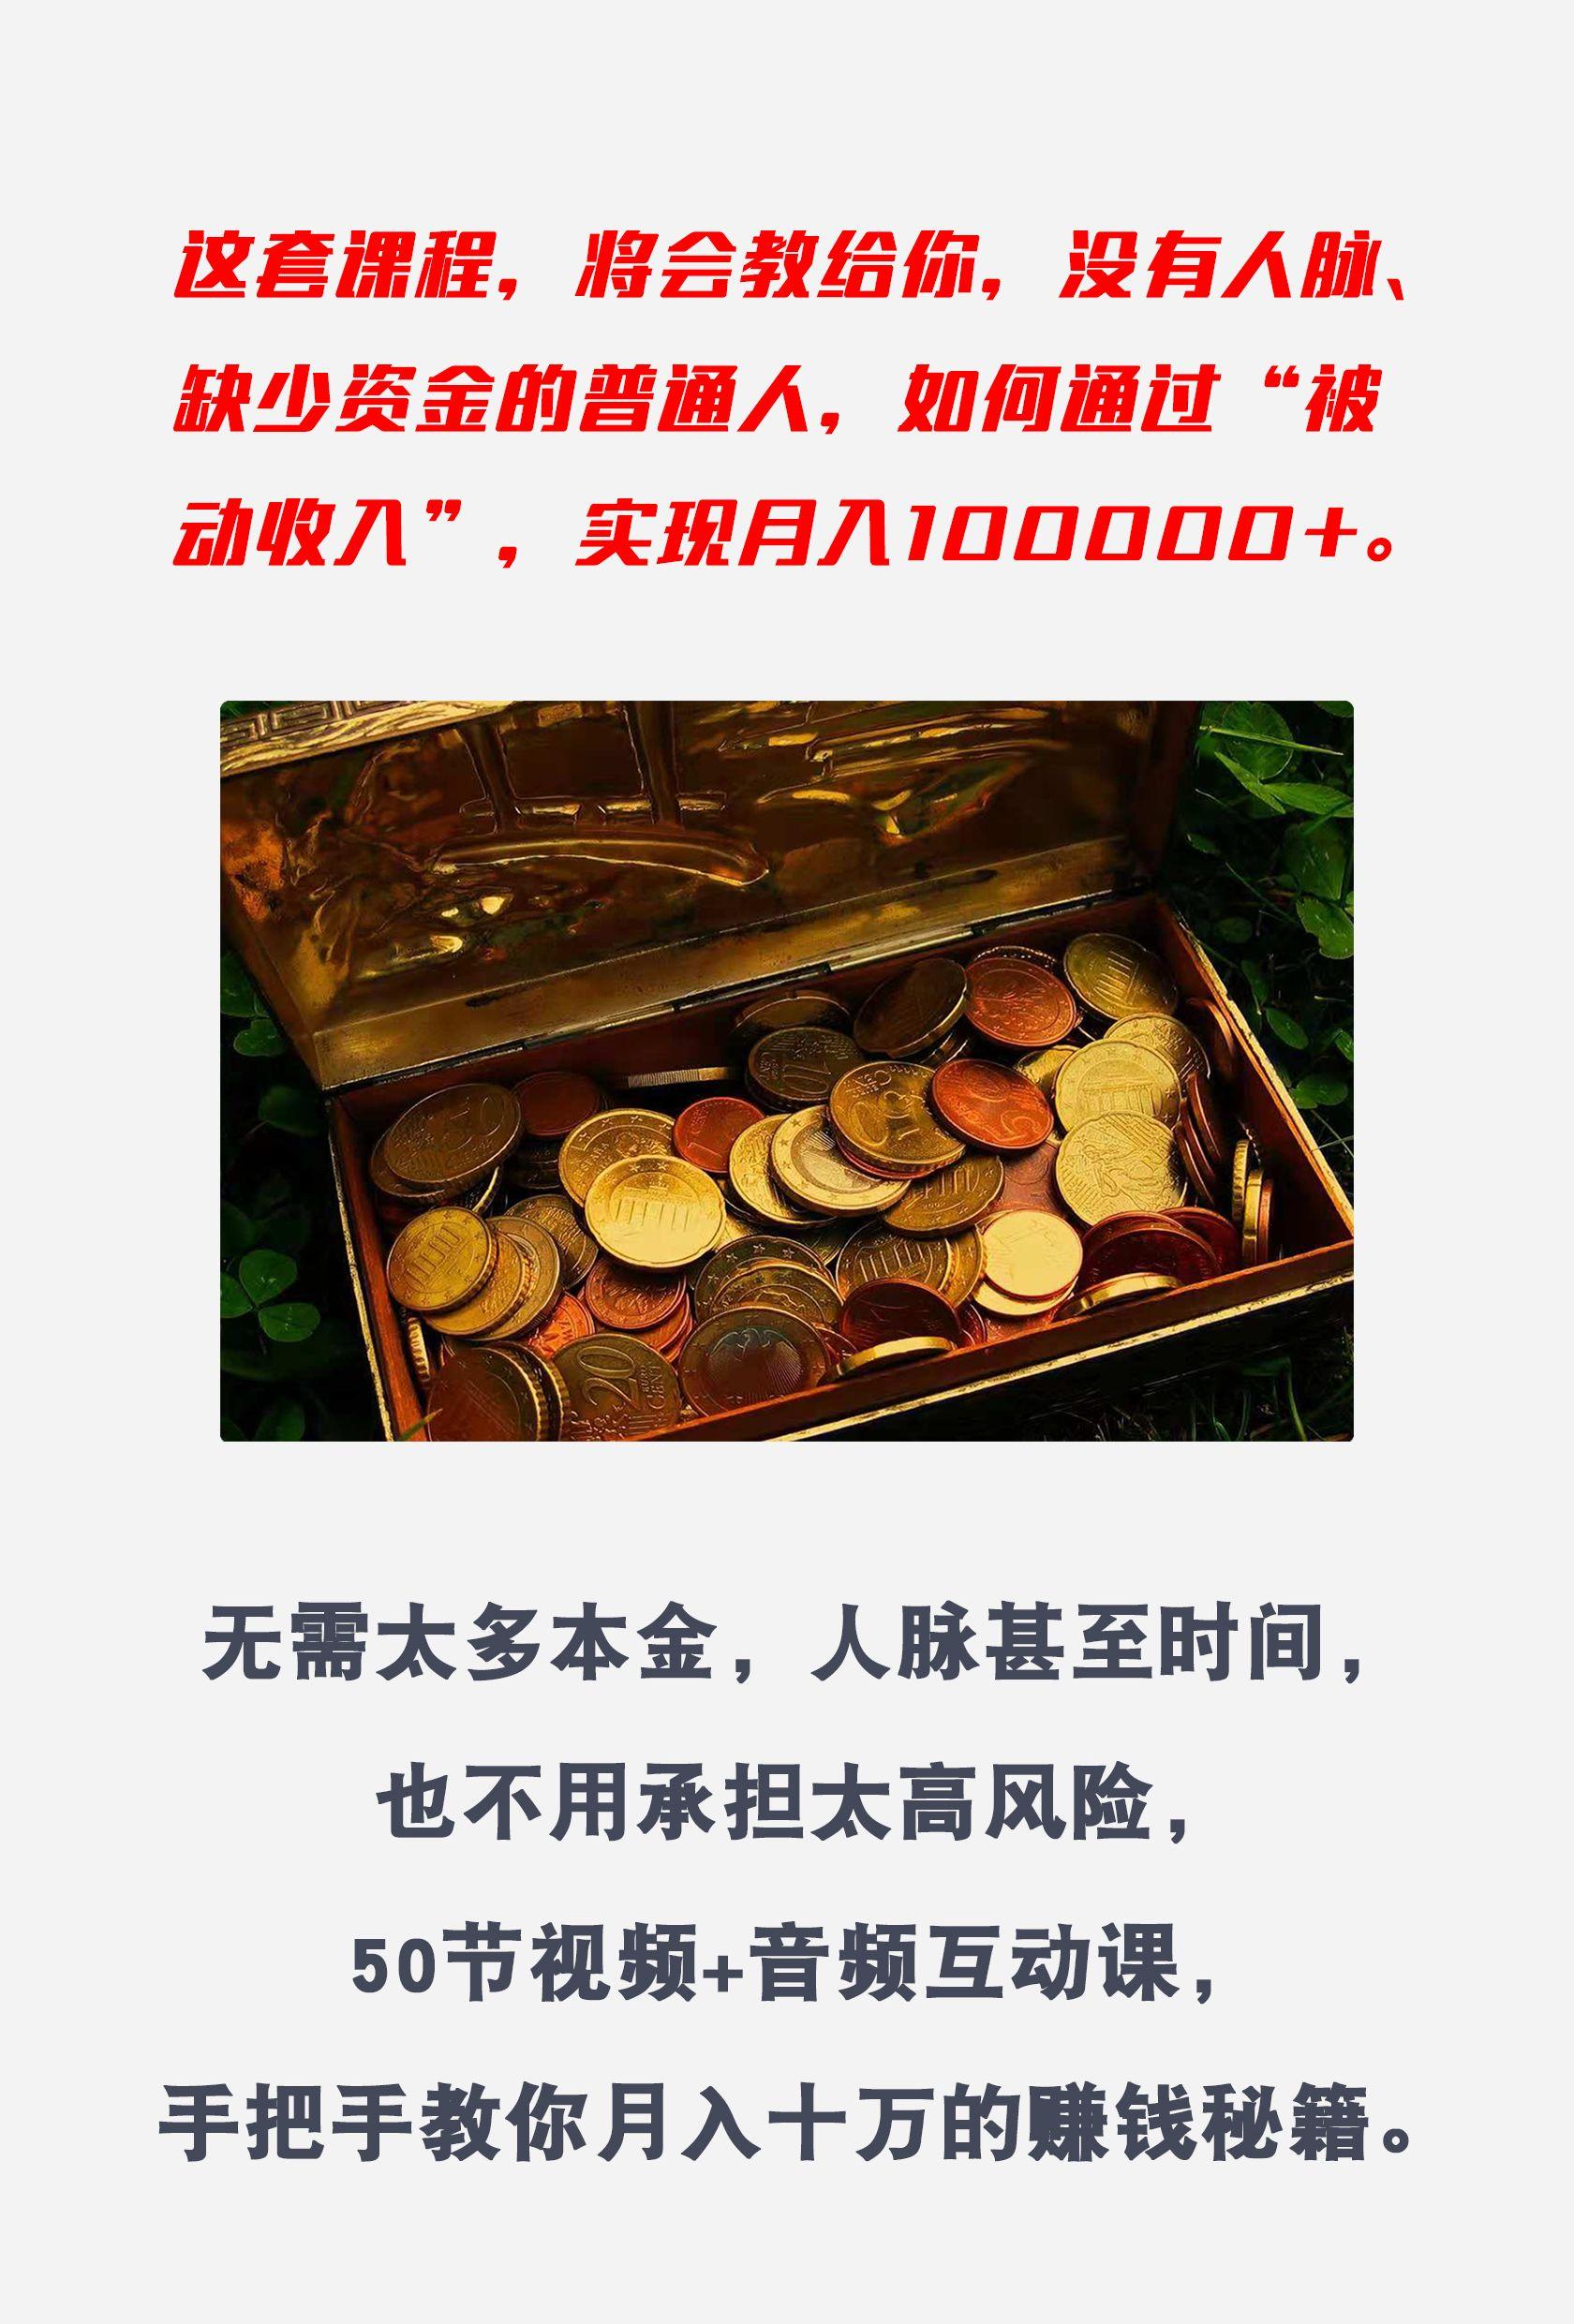 file_1551618864862.png